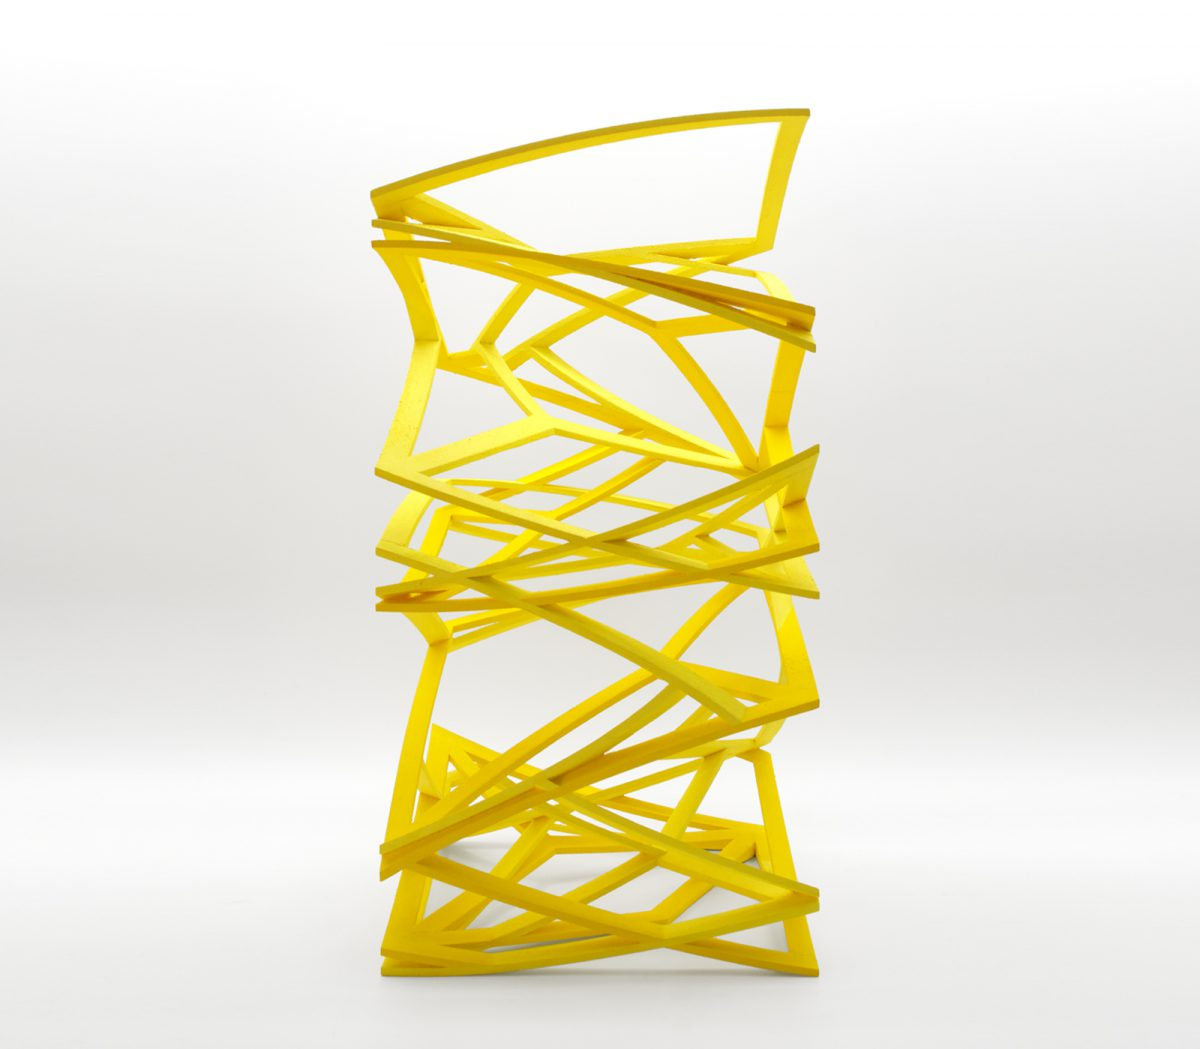 Atelier_Aescht_Cube_Formation_01_01_Installation_1600_1060